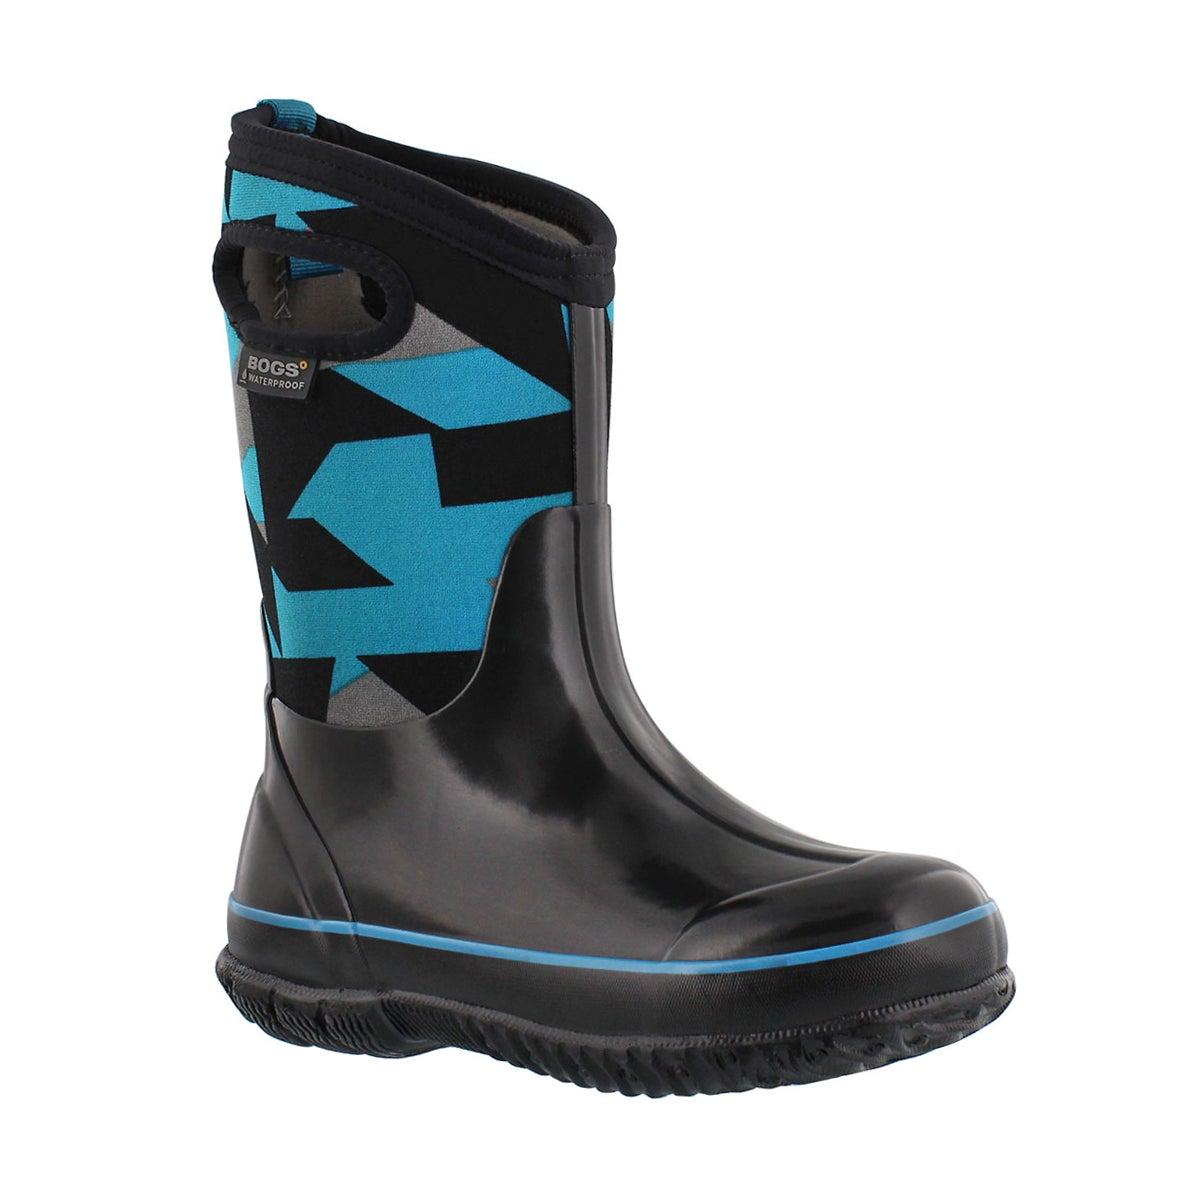 Boys' CLASSIC GEO black/blue waterproof boots